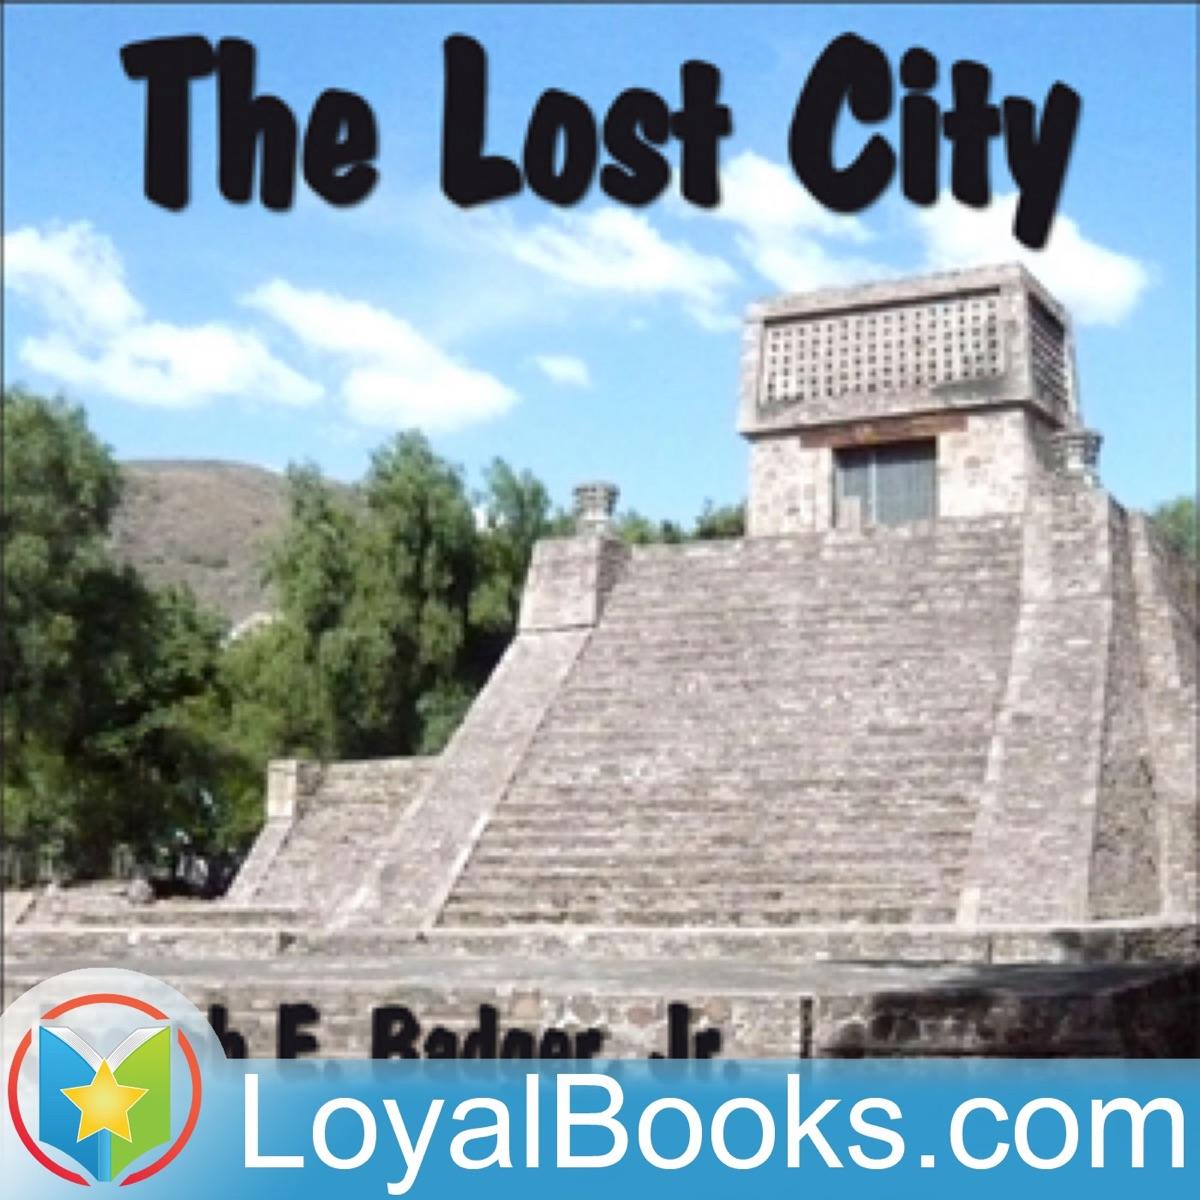 The Lost City by Joseph E. Badger, Jr